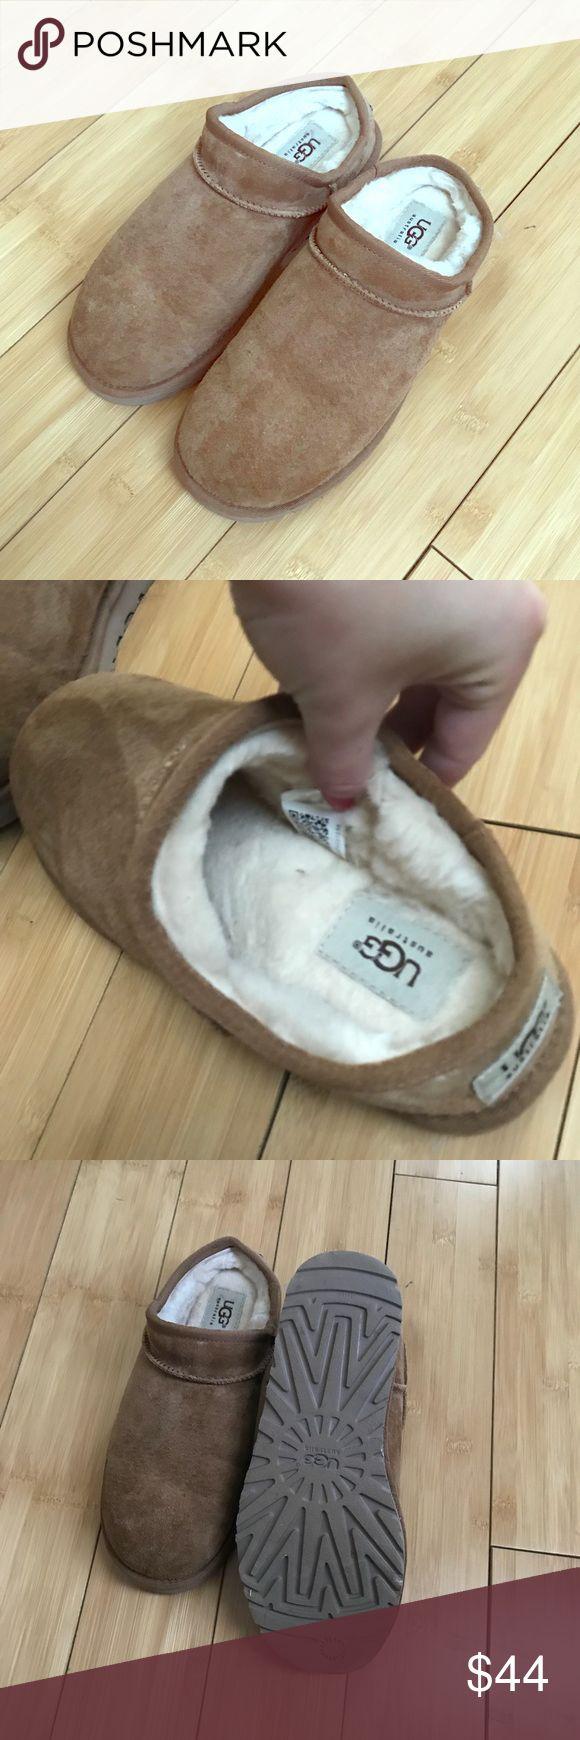 Best 25 ugg slippers ideas on pinterest grey ugg slippers ugg slipper size 7 nvjuhfo Images